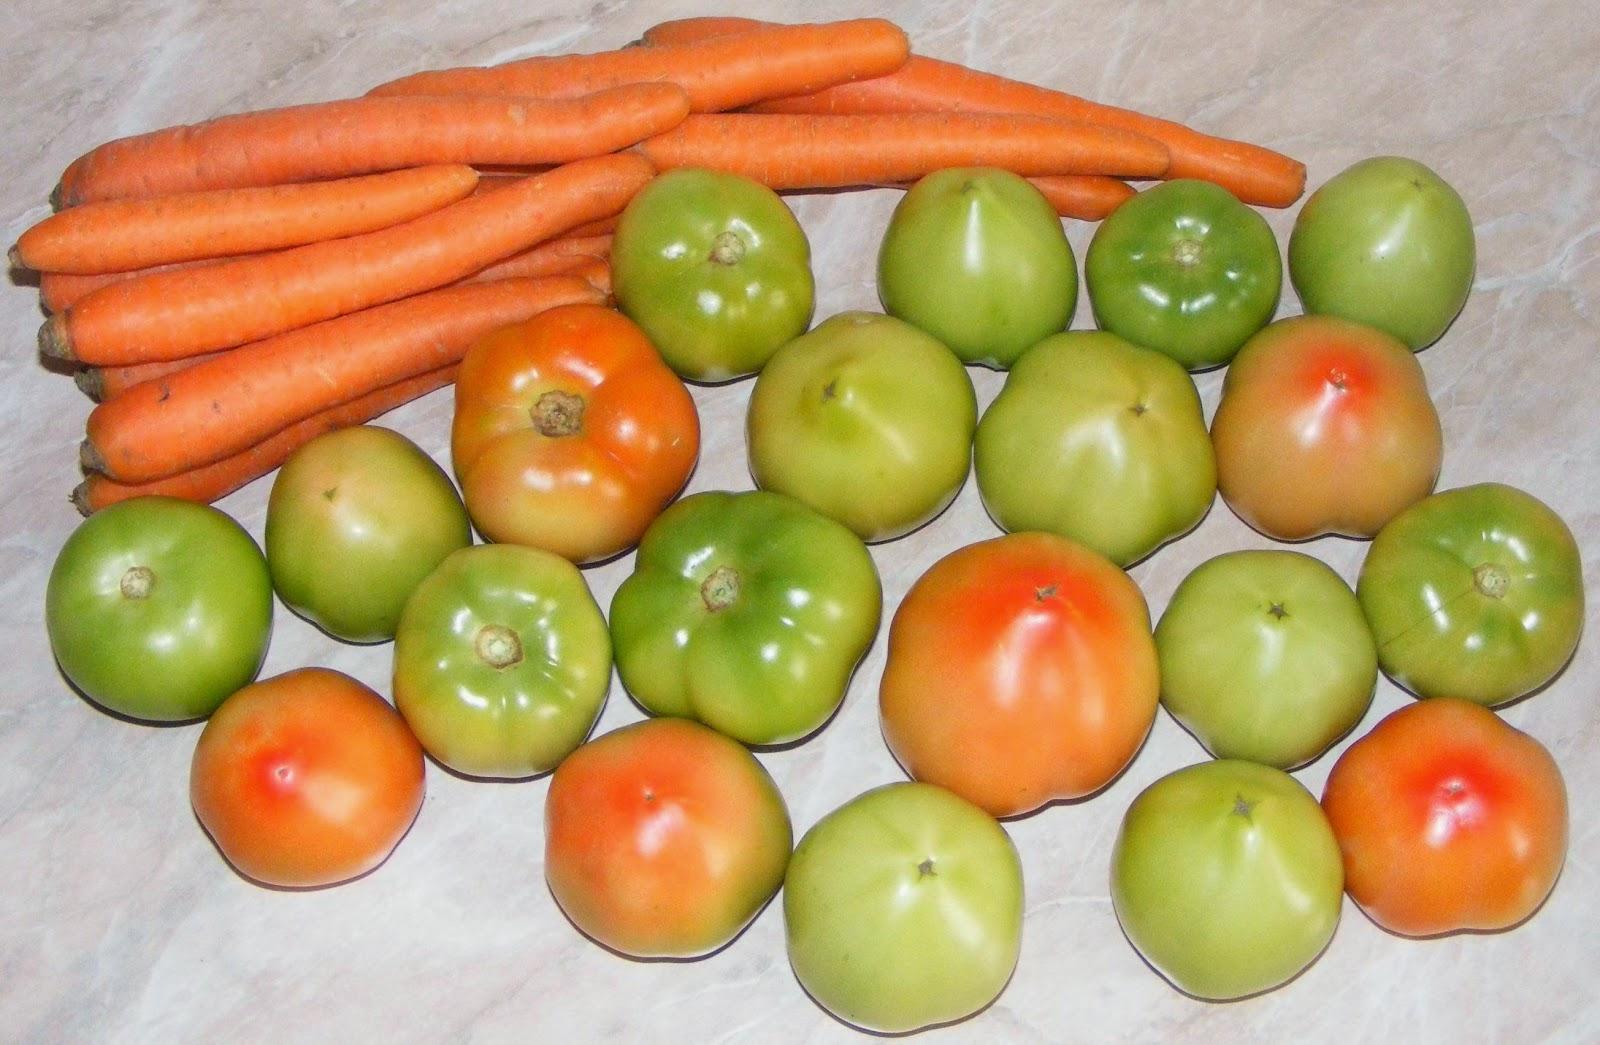 morcovi, morcov, gogonele rosii verzi, gogonea, legume, legume pentru muraturi, ingrediente muraturi, legume pentru murat, retete de muraturi, retete muraturi, retete pentru iarna, retete muraturi in otet, retete culinare, legume romanesti proaspete, muraturi ingrediente,